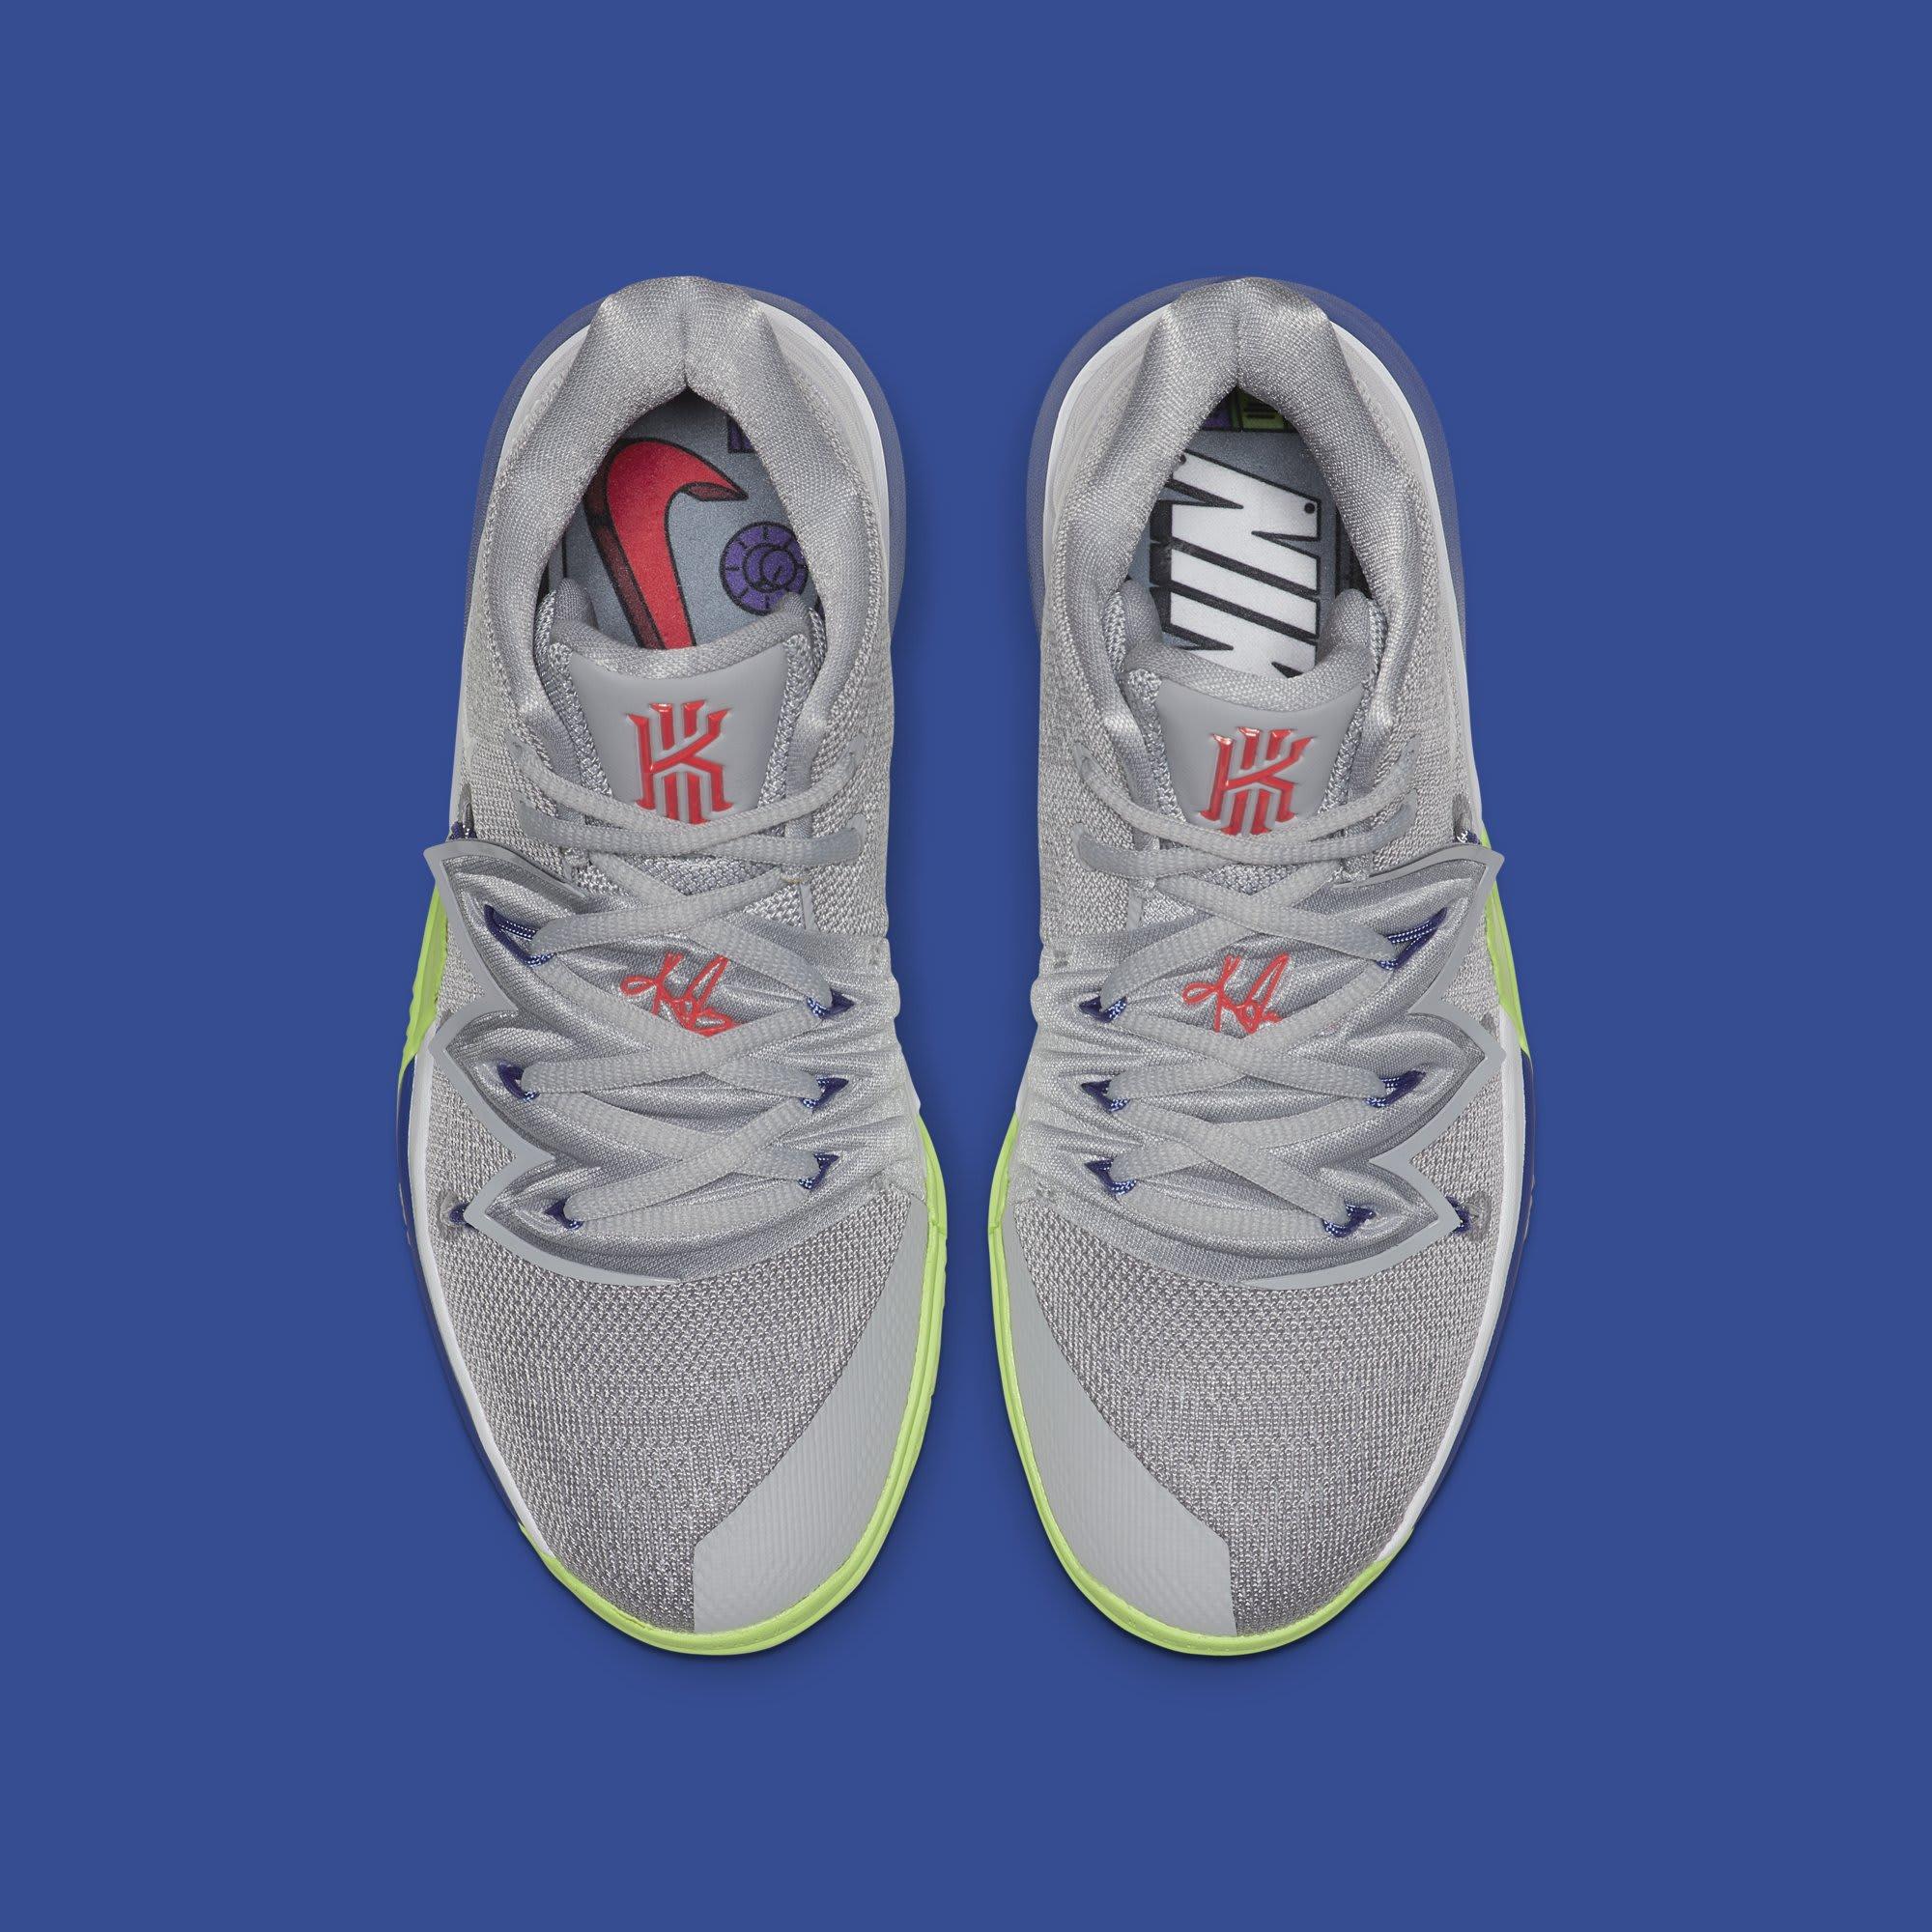 Nike Kyrie 5 AQ2456-099 (Top)